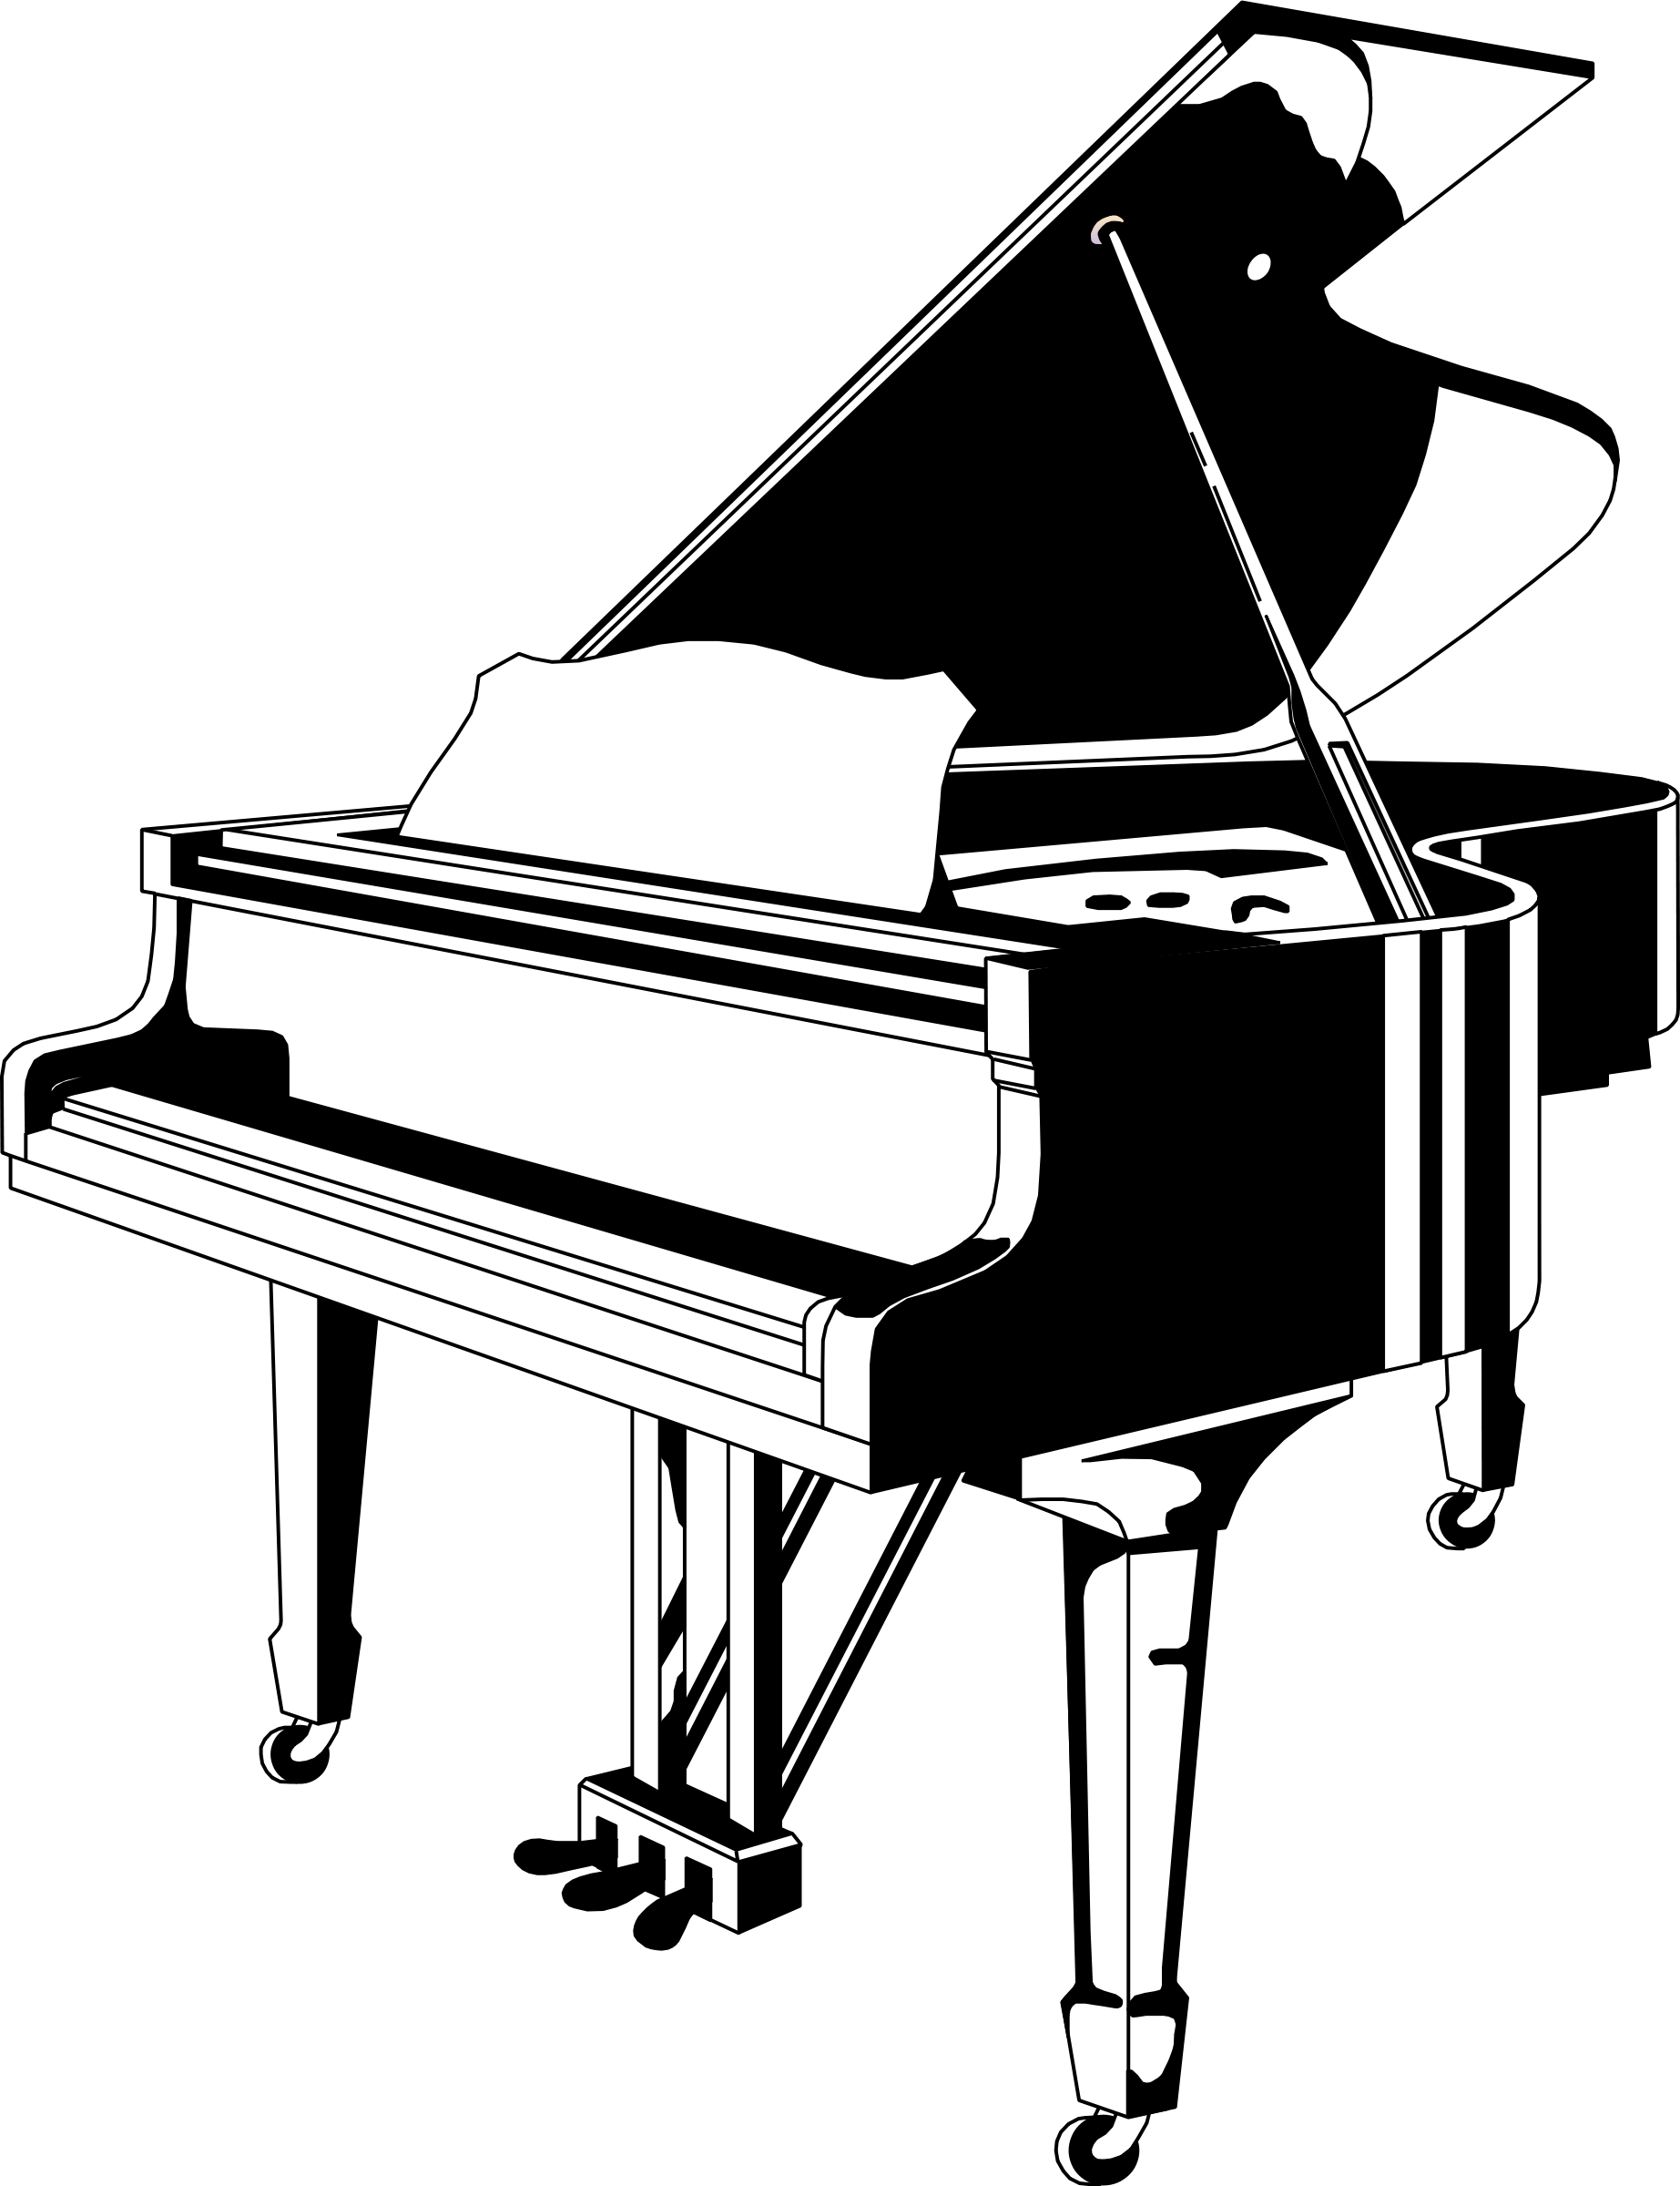 clipart piano black white clipart panda free clipart images rh clipartpanda com